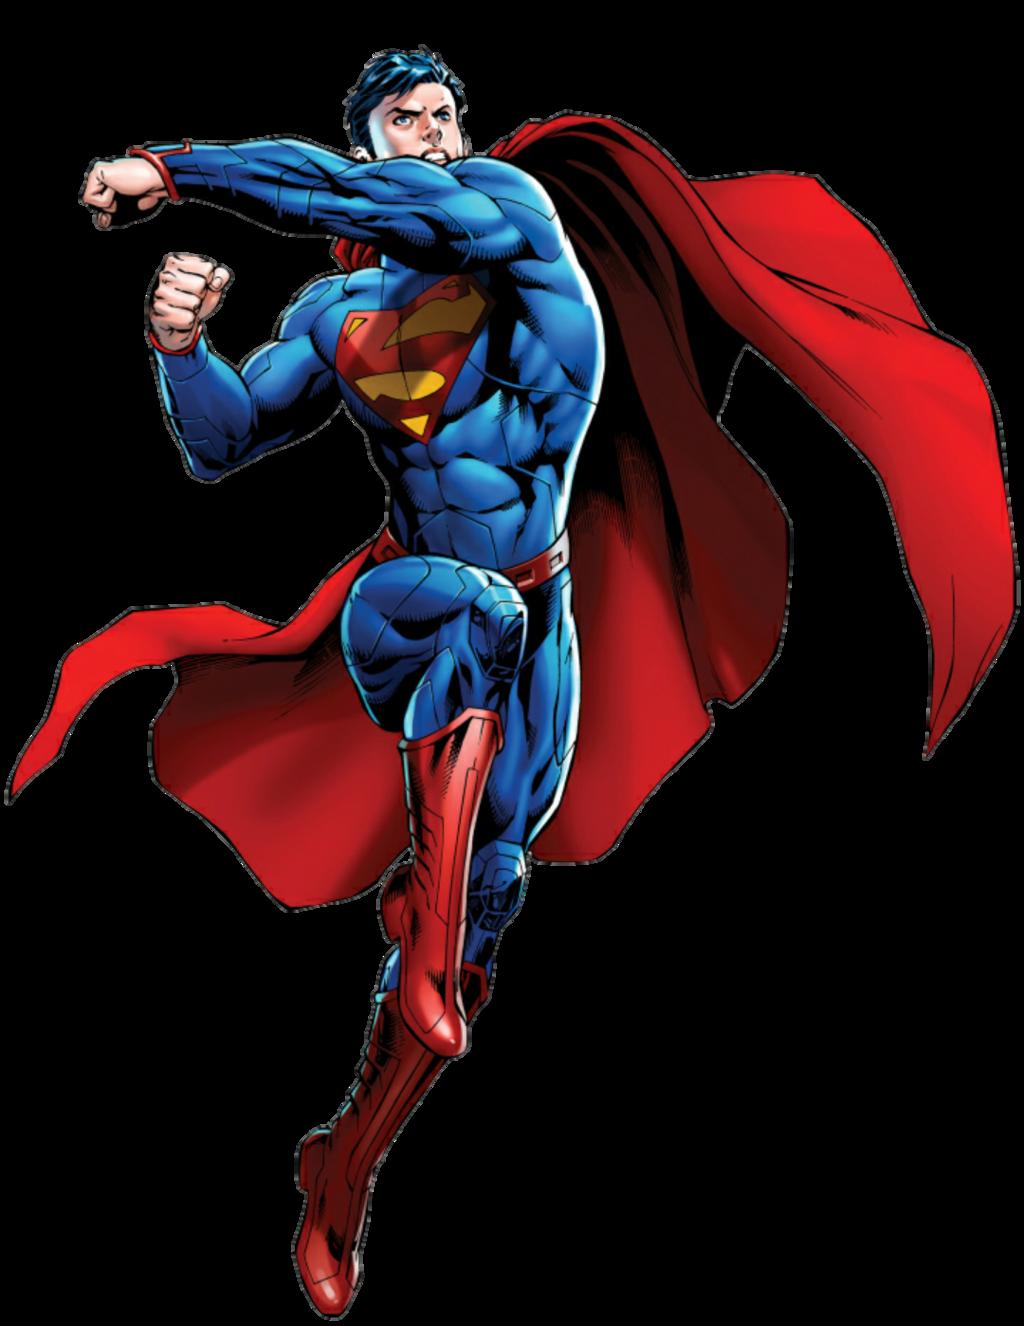 Download Superman Image HQ PNG Image.